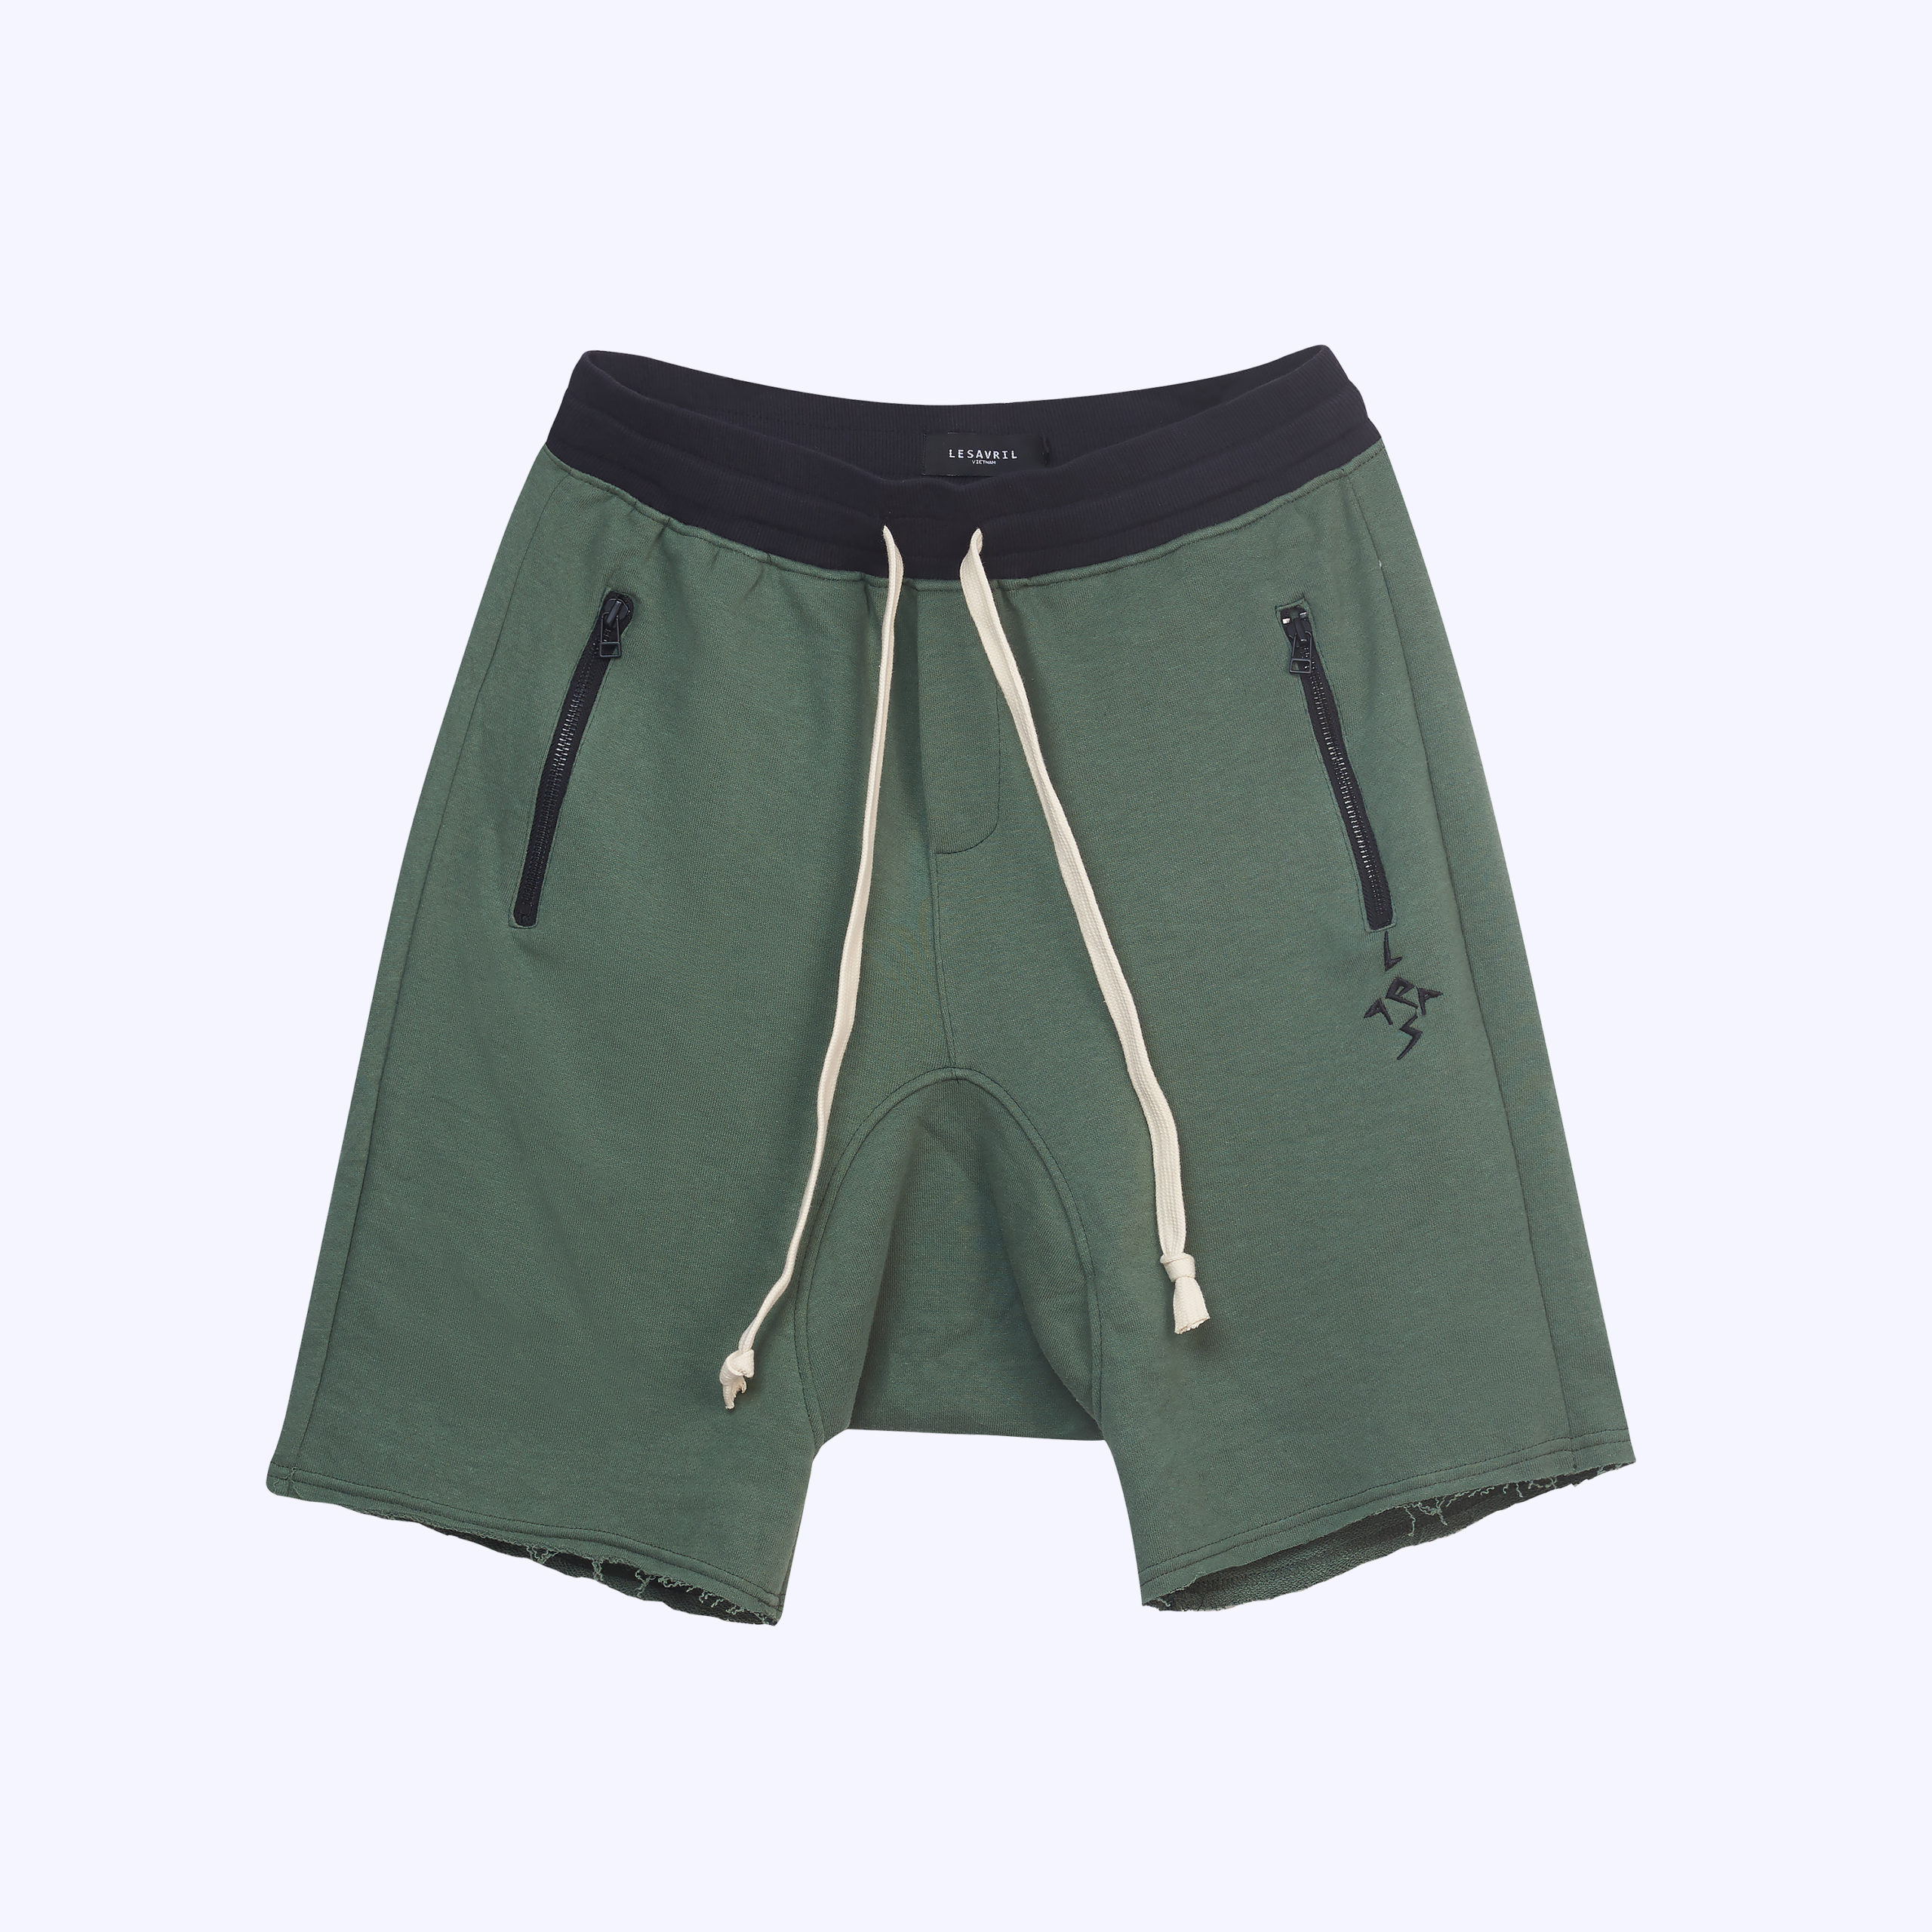 Moss Drop-crotch Short